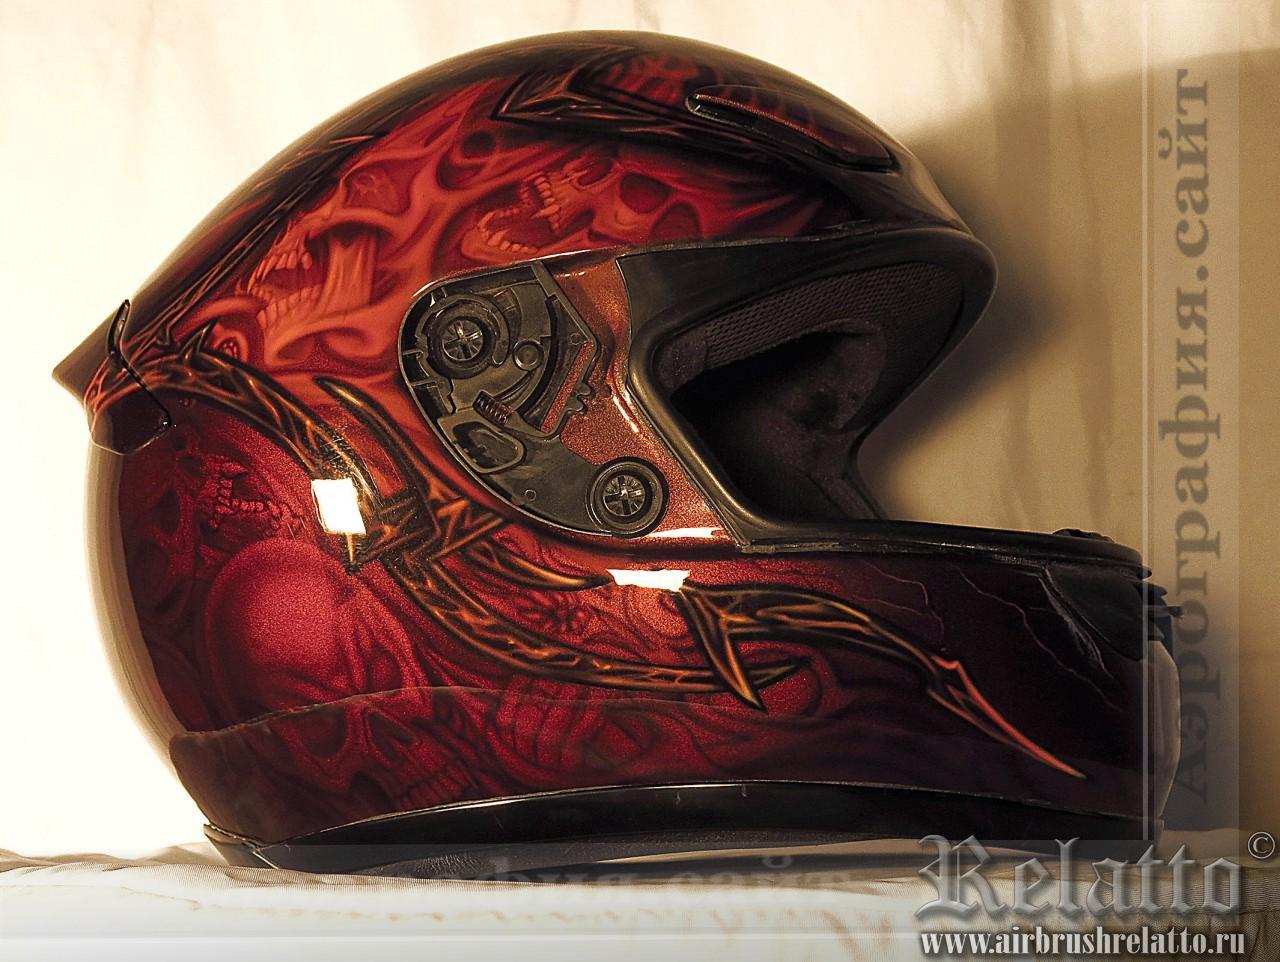 Аэрография шлема